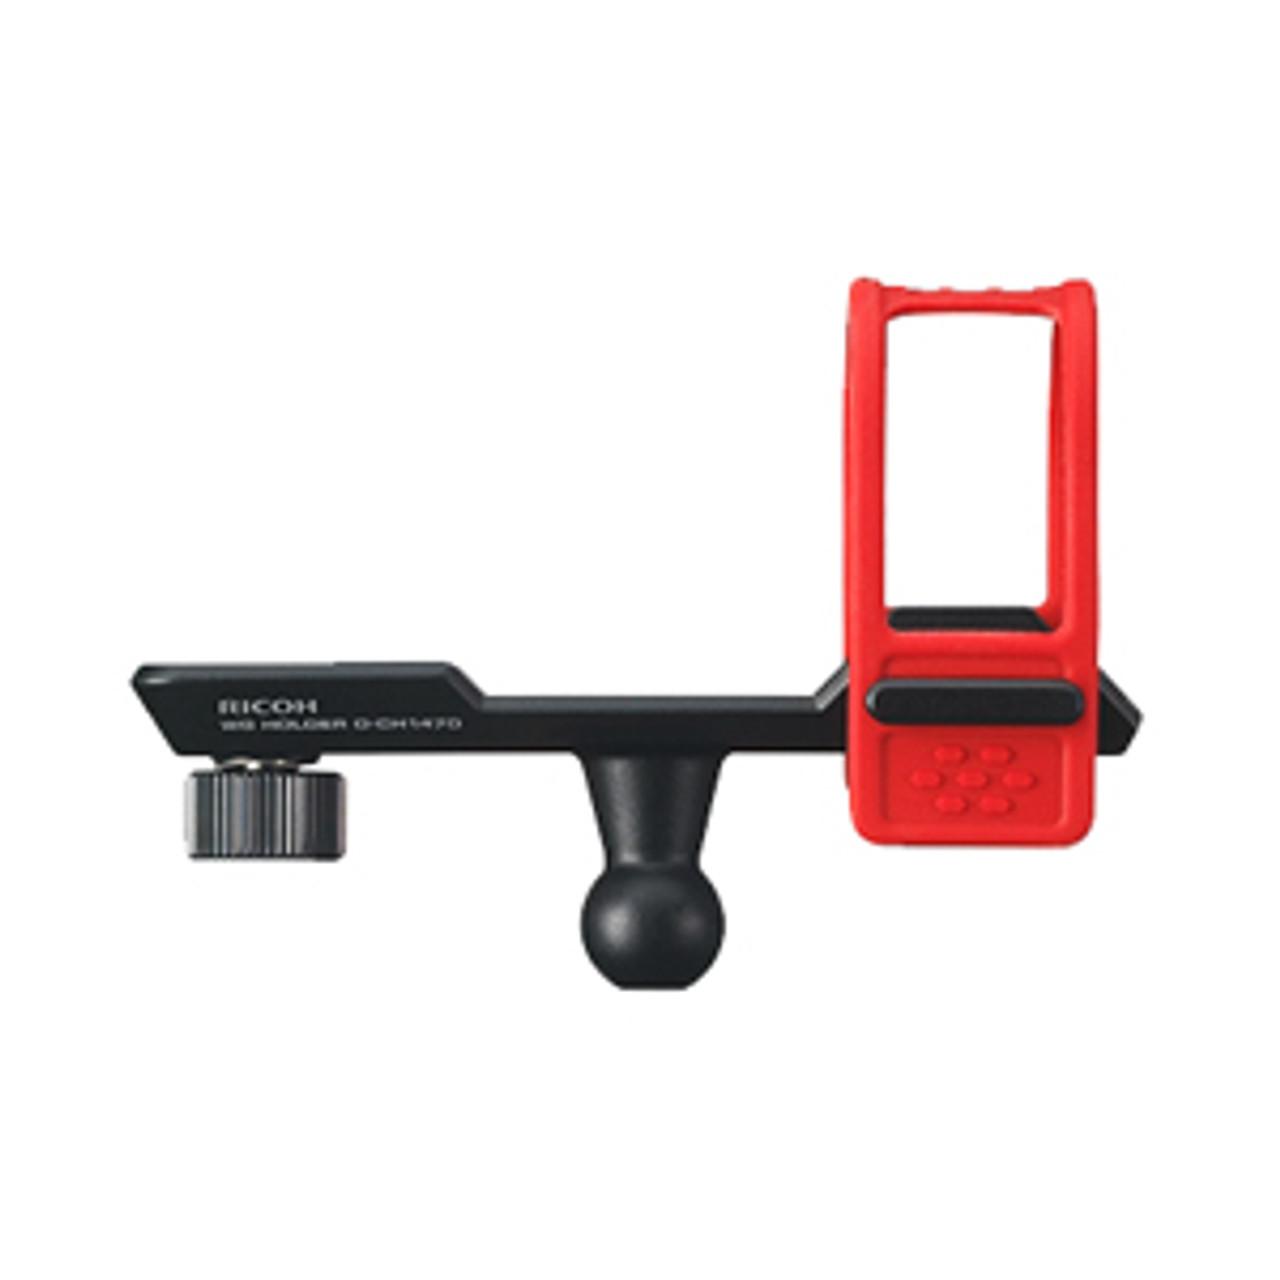 Ricoh O-CH1470 WG Camera Holder (Clearance Item)